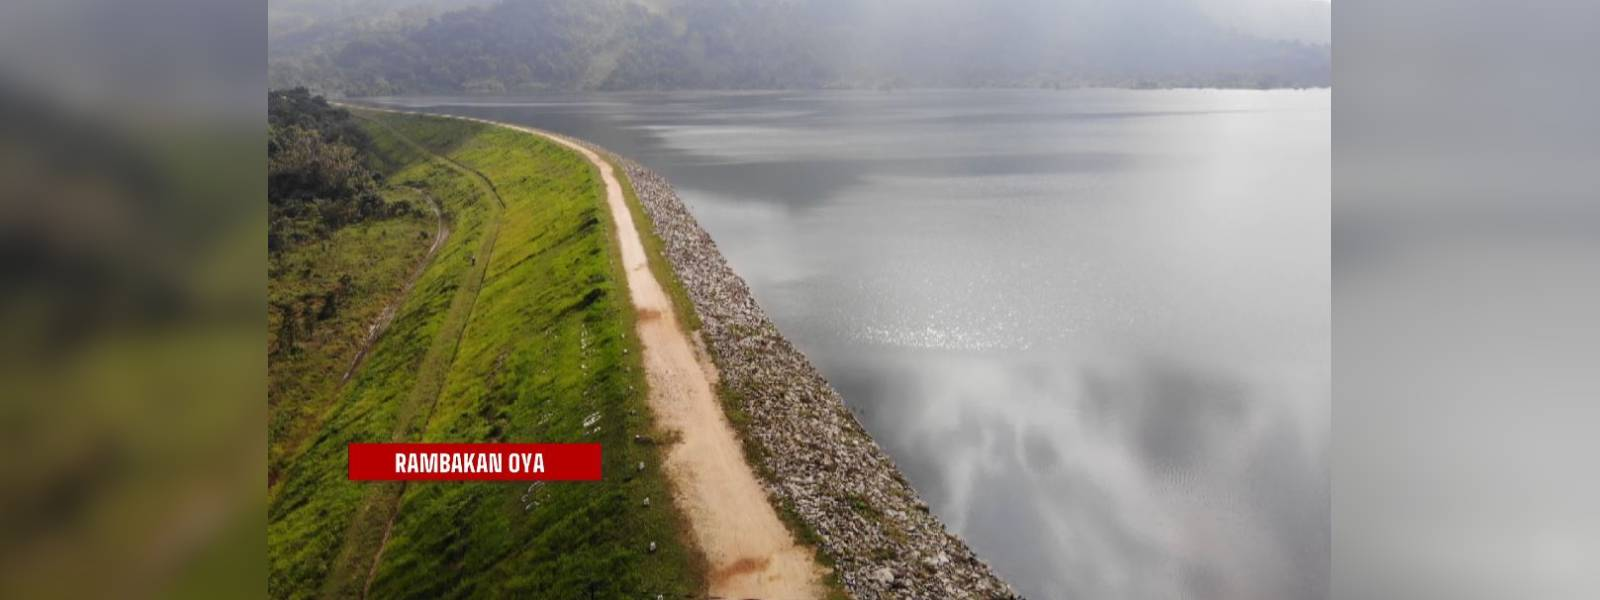 Galawalayaya residents lament loss of lands near Rambakan Oya